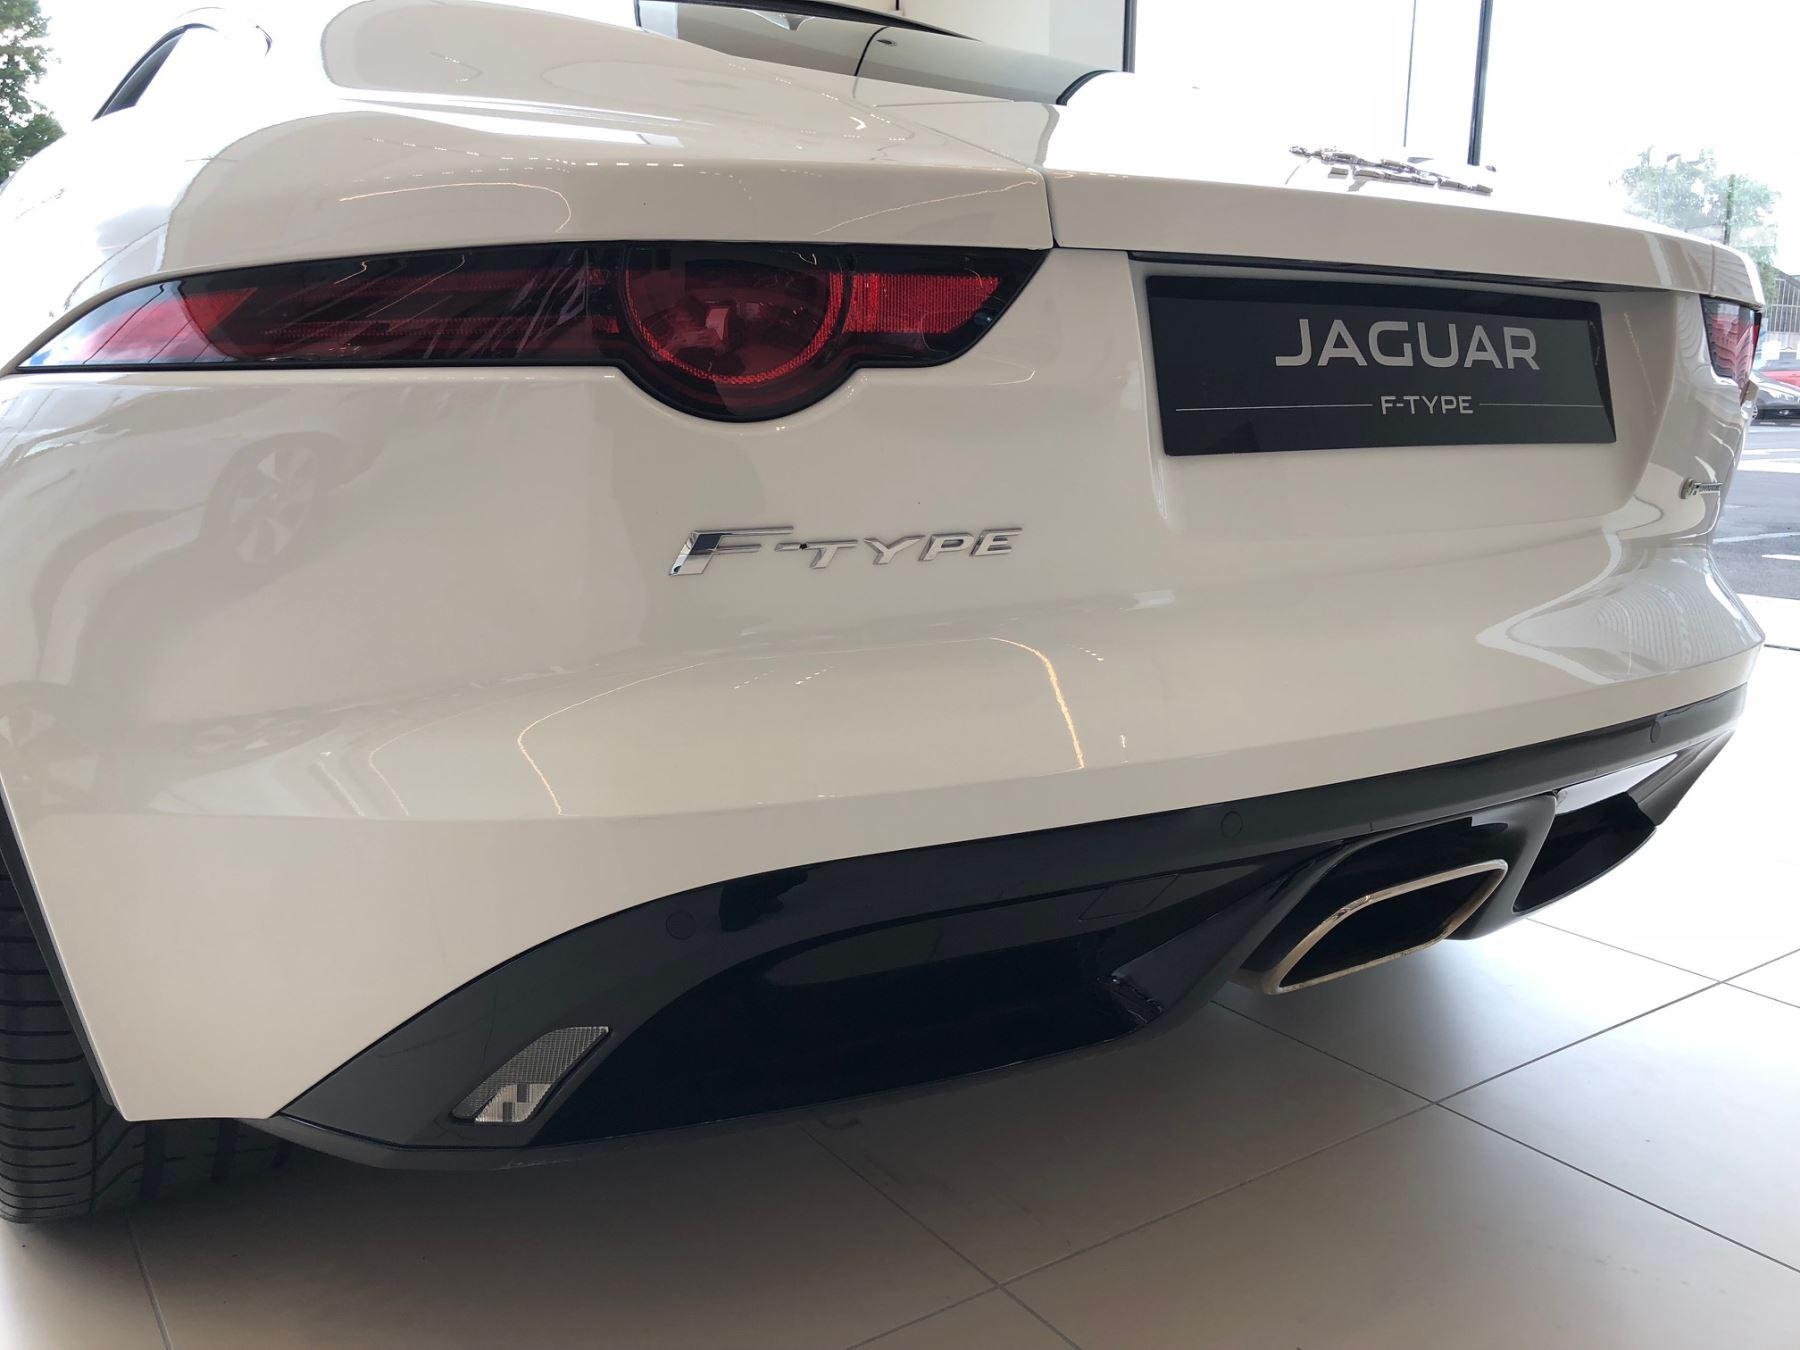 Jaguar F-TYPE 2.0 R-Dynamic image 8